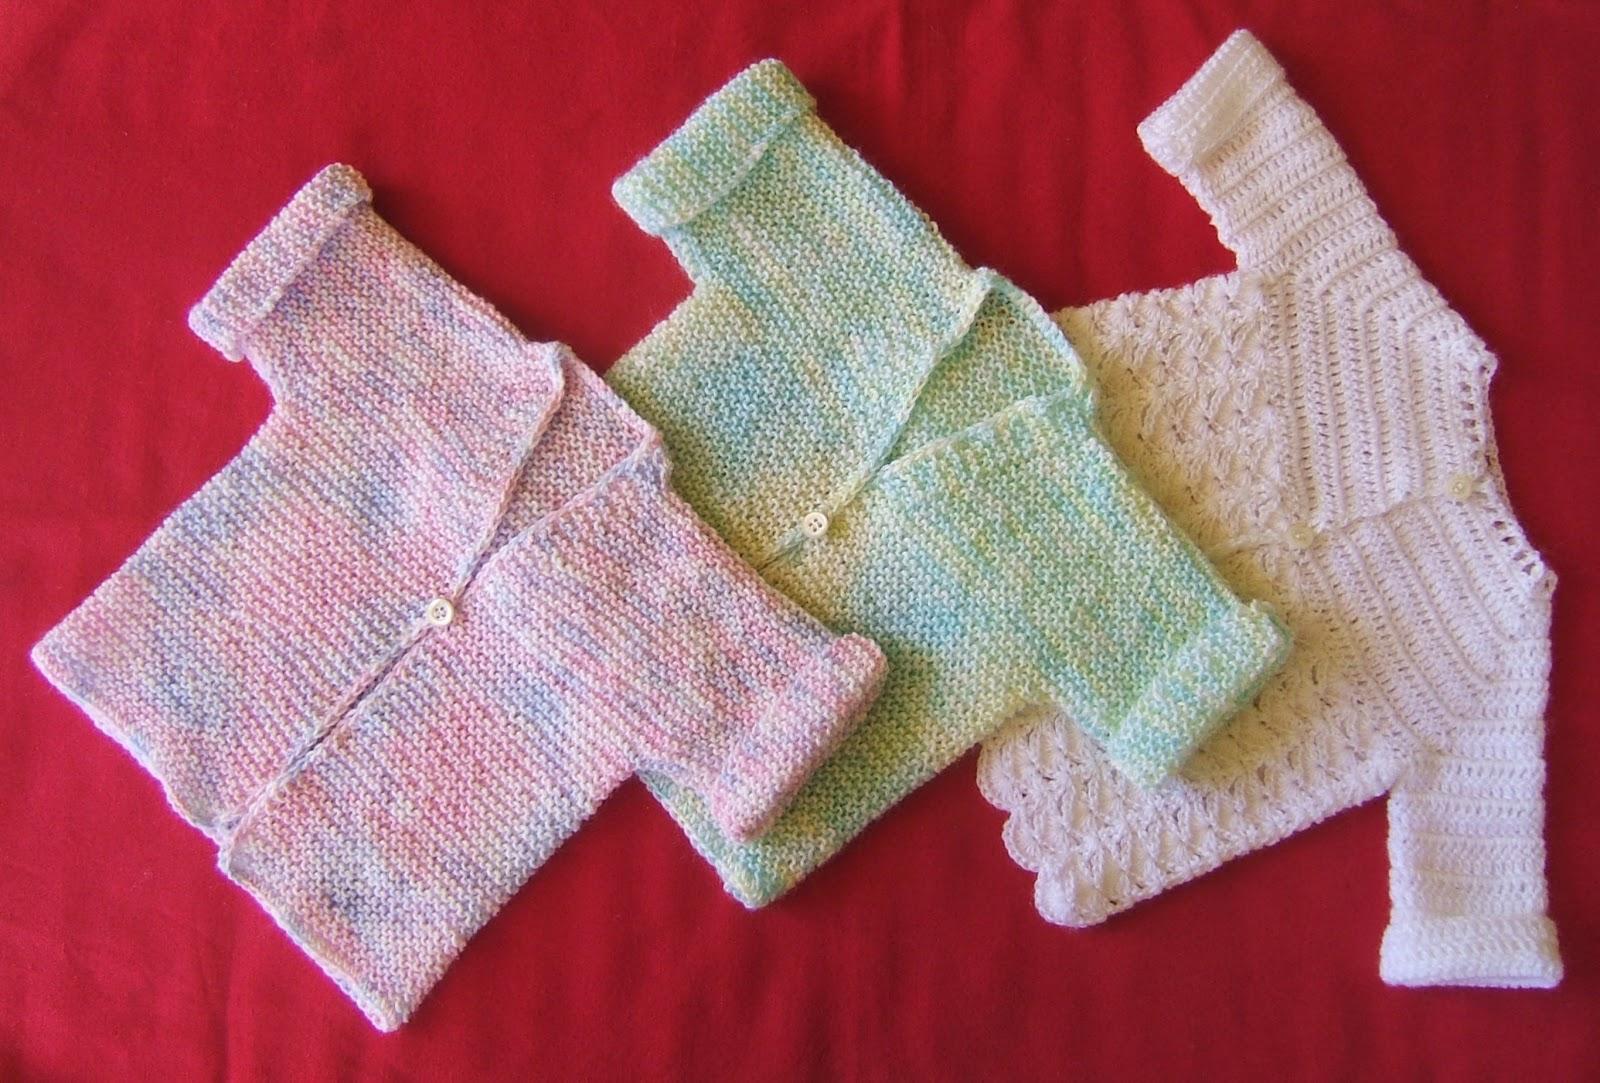 d4f4aac11ba9 aussie knitting threads  Baby jackets